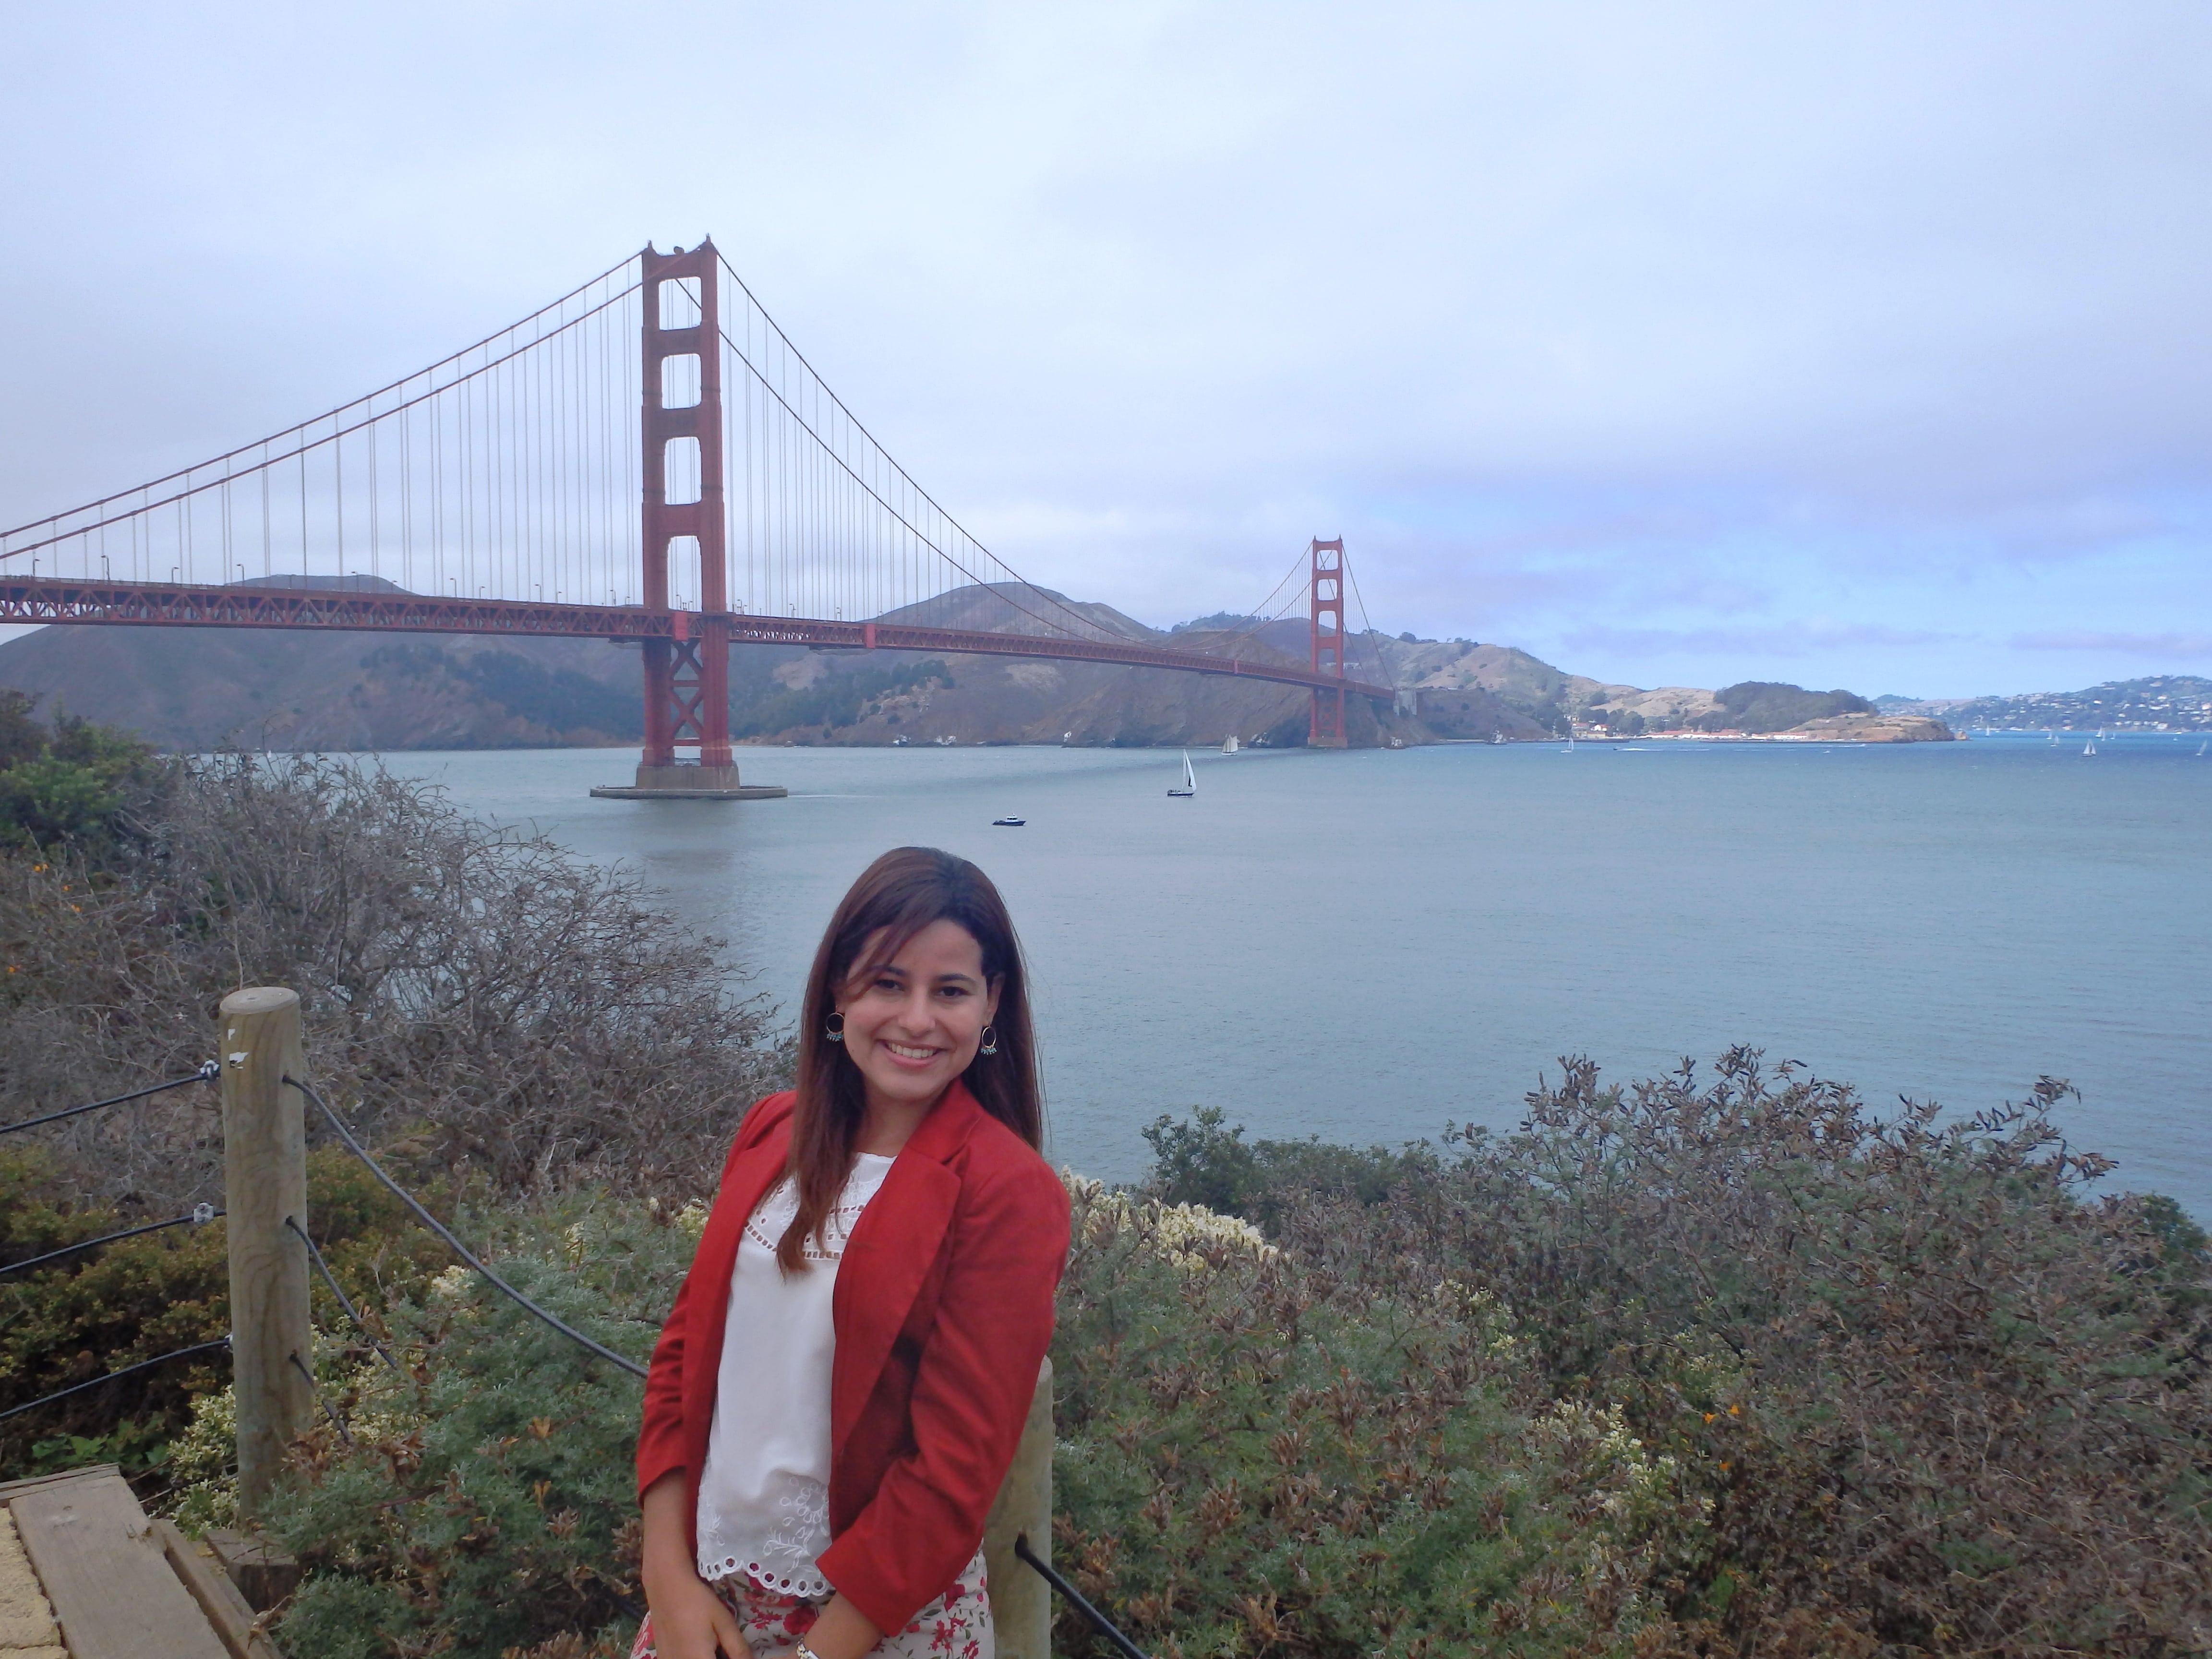 5 destinos que vale a pena voltar de novo - San Francisco